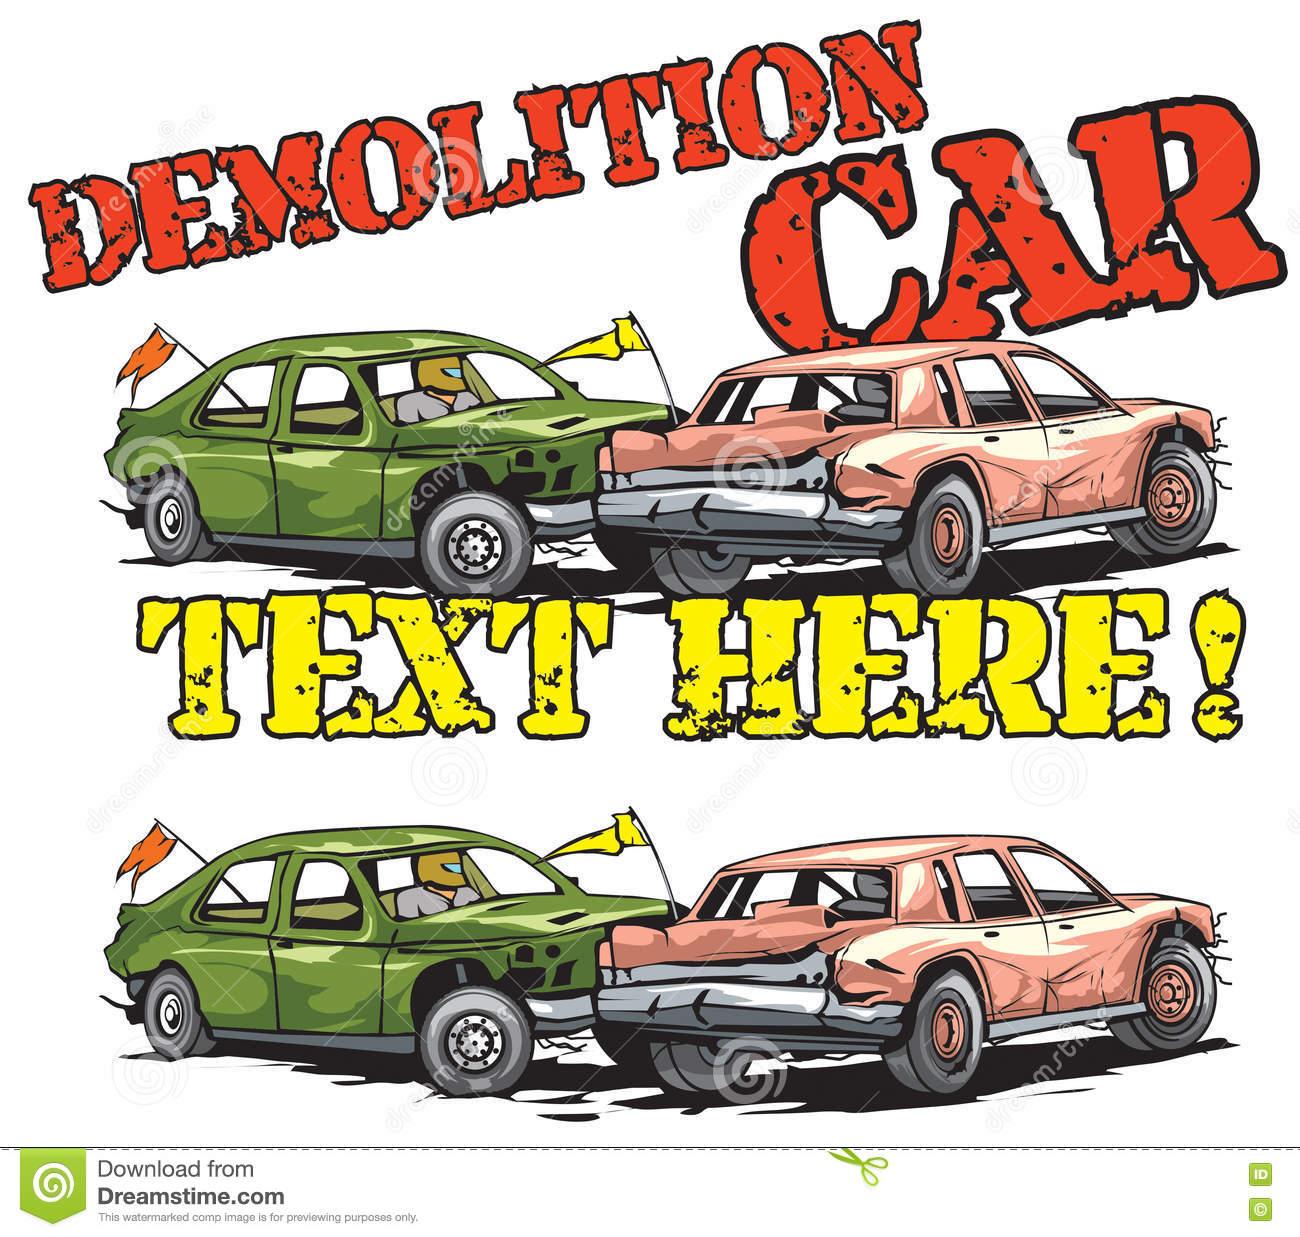 Demolition derby car clipart 7 » Clipart Station.